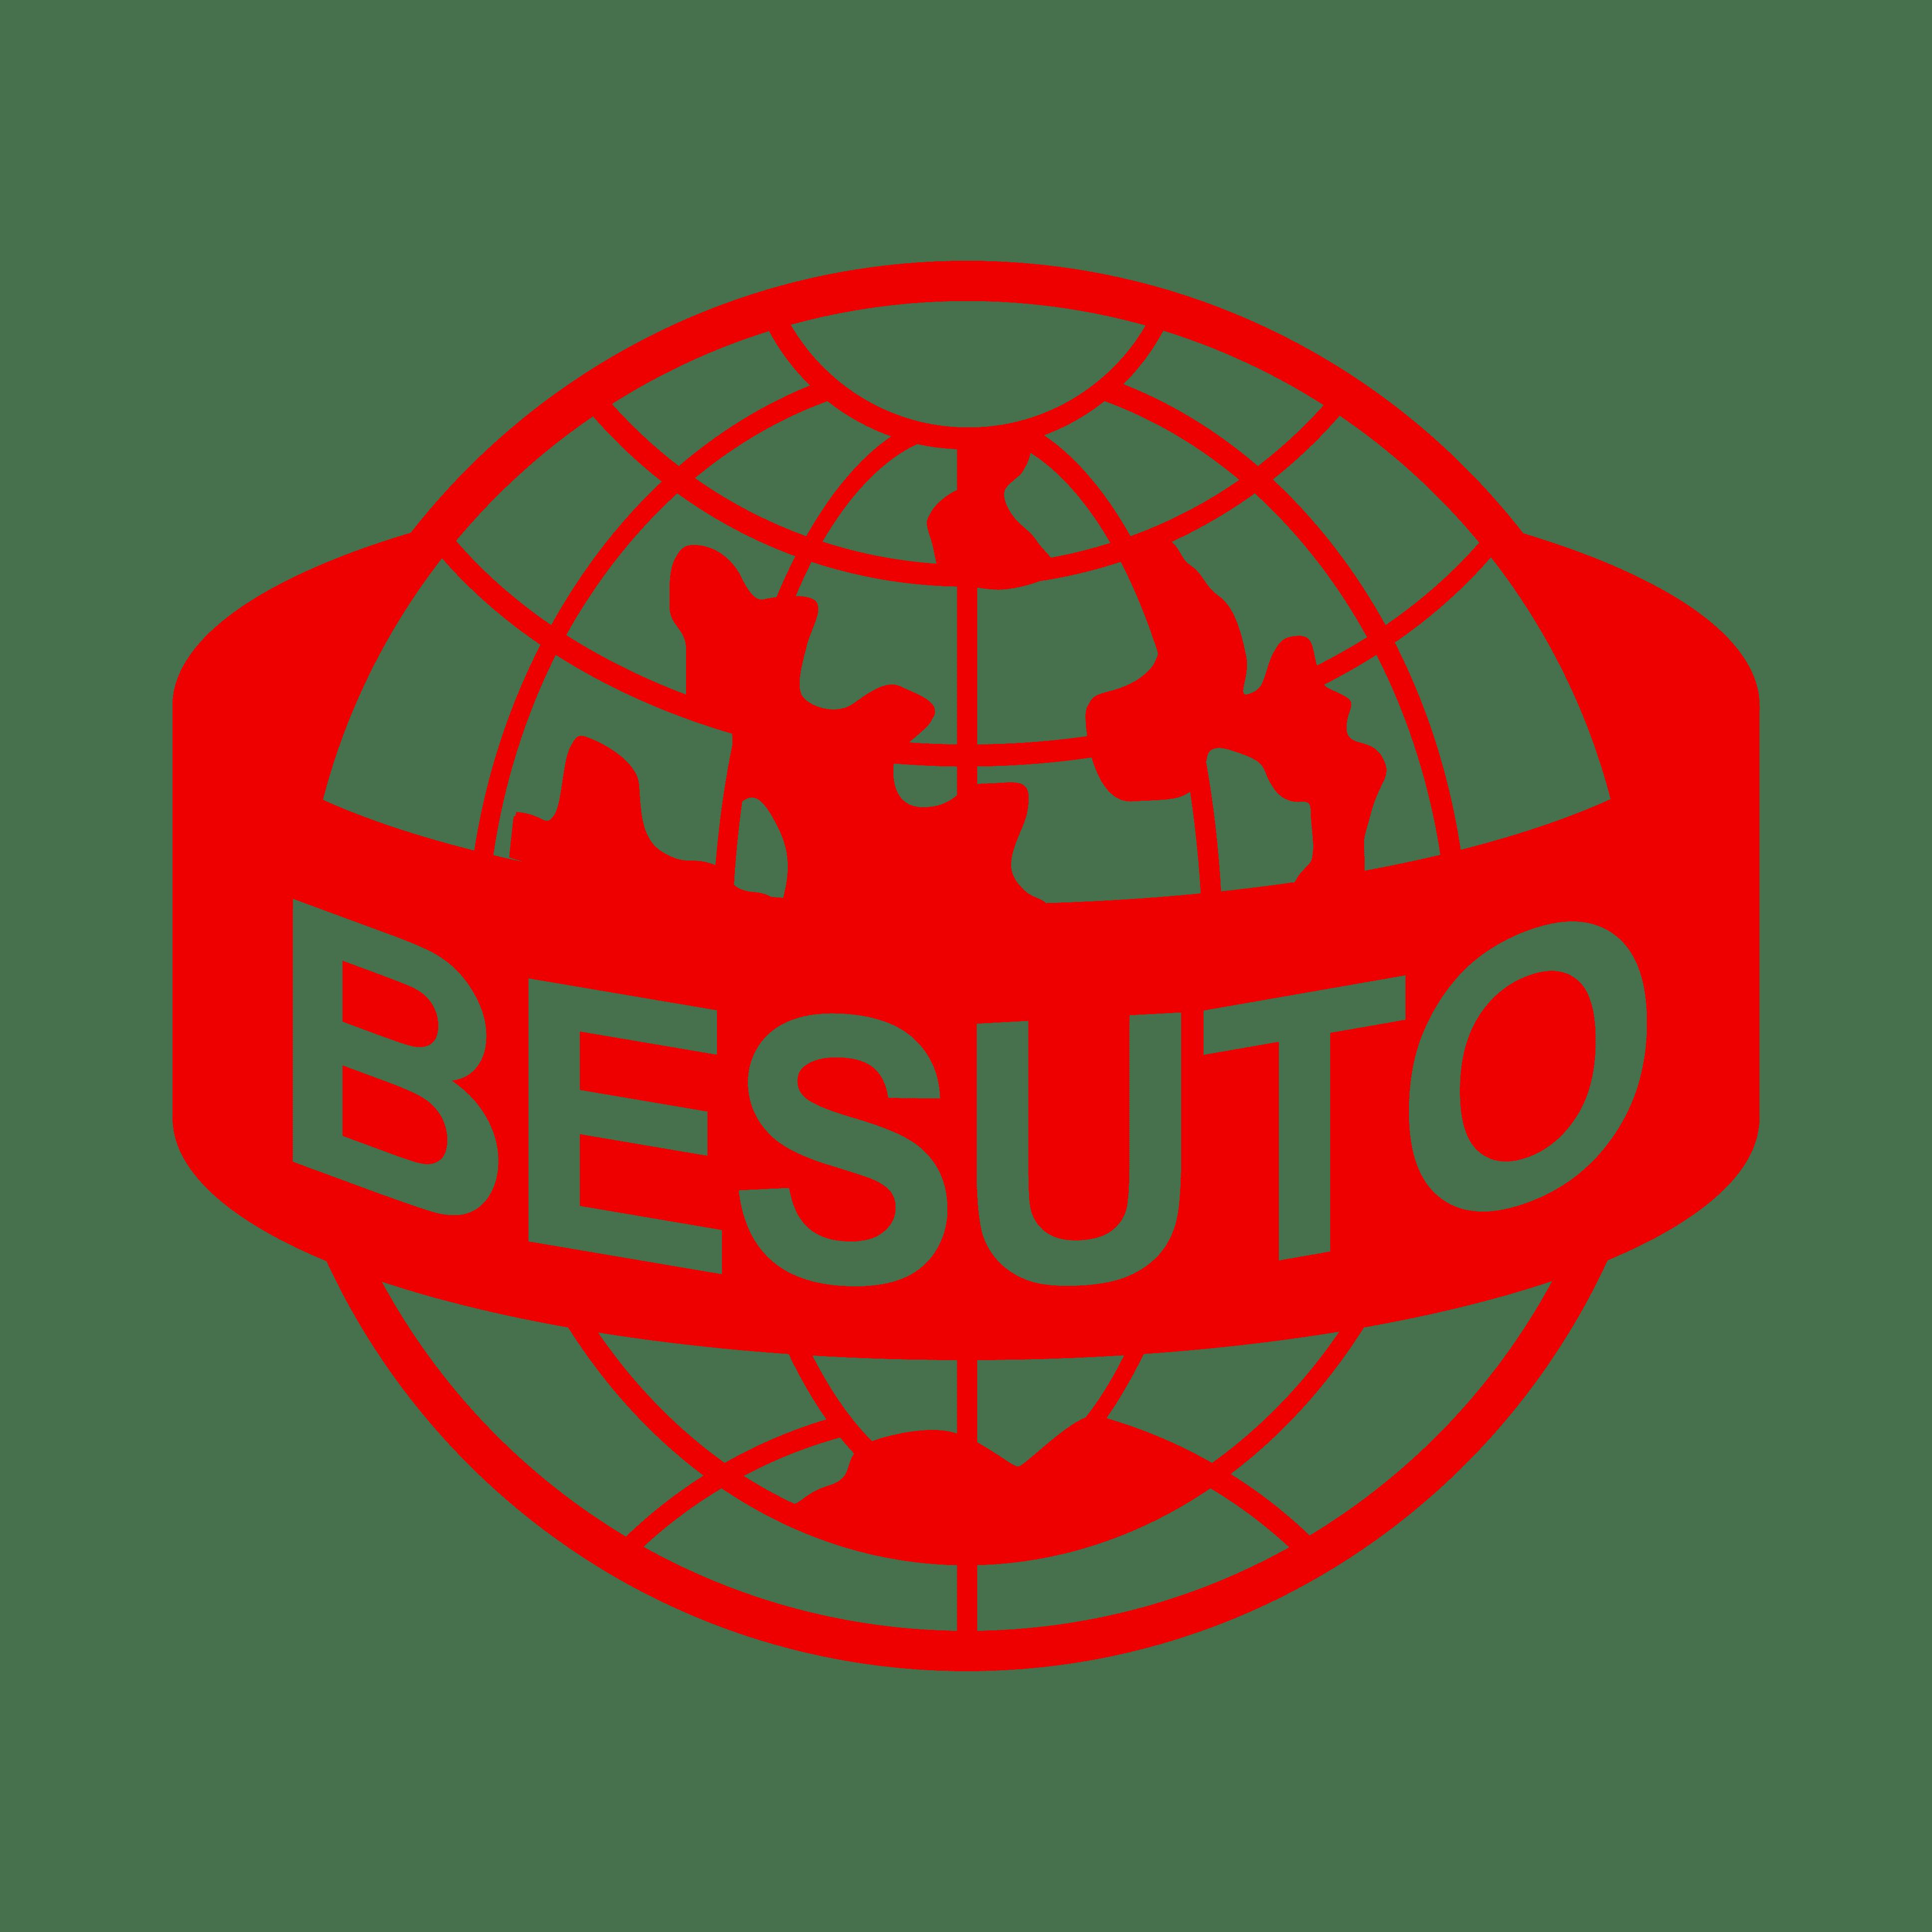 besutofoodcorp.com